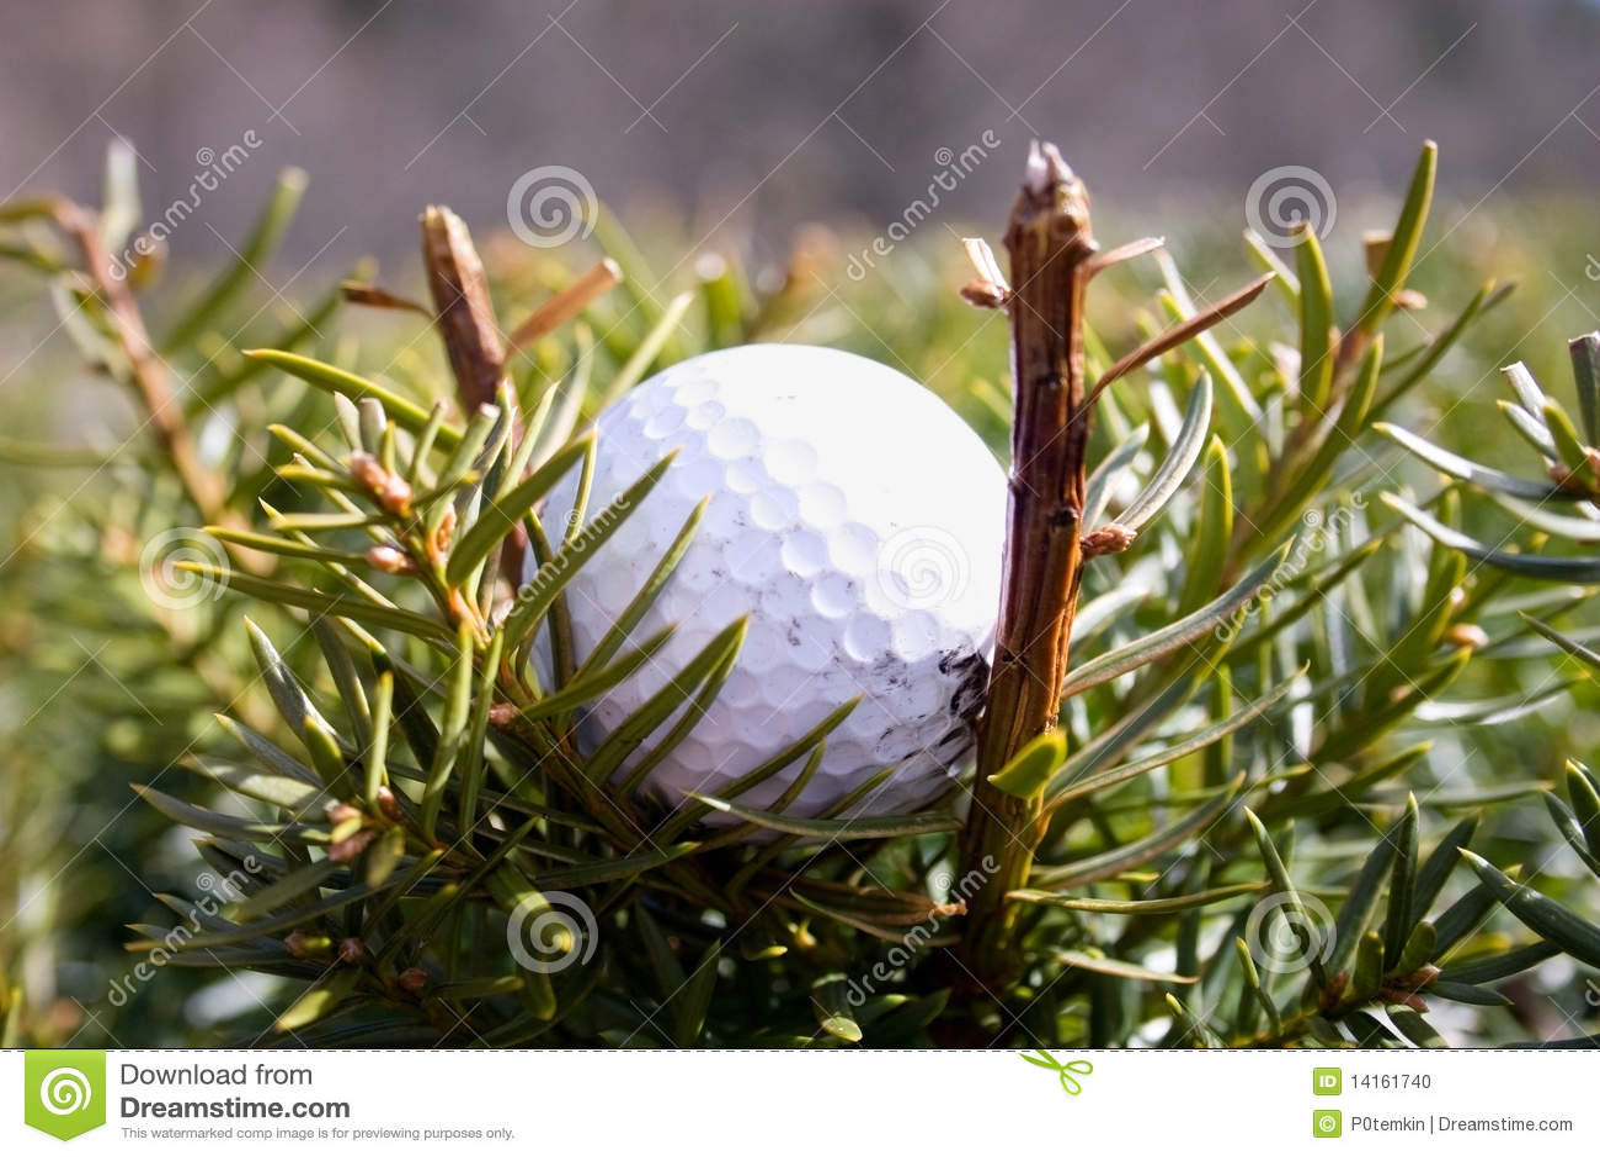 Misplaatste Golfball